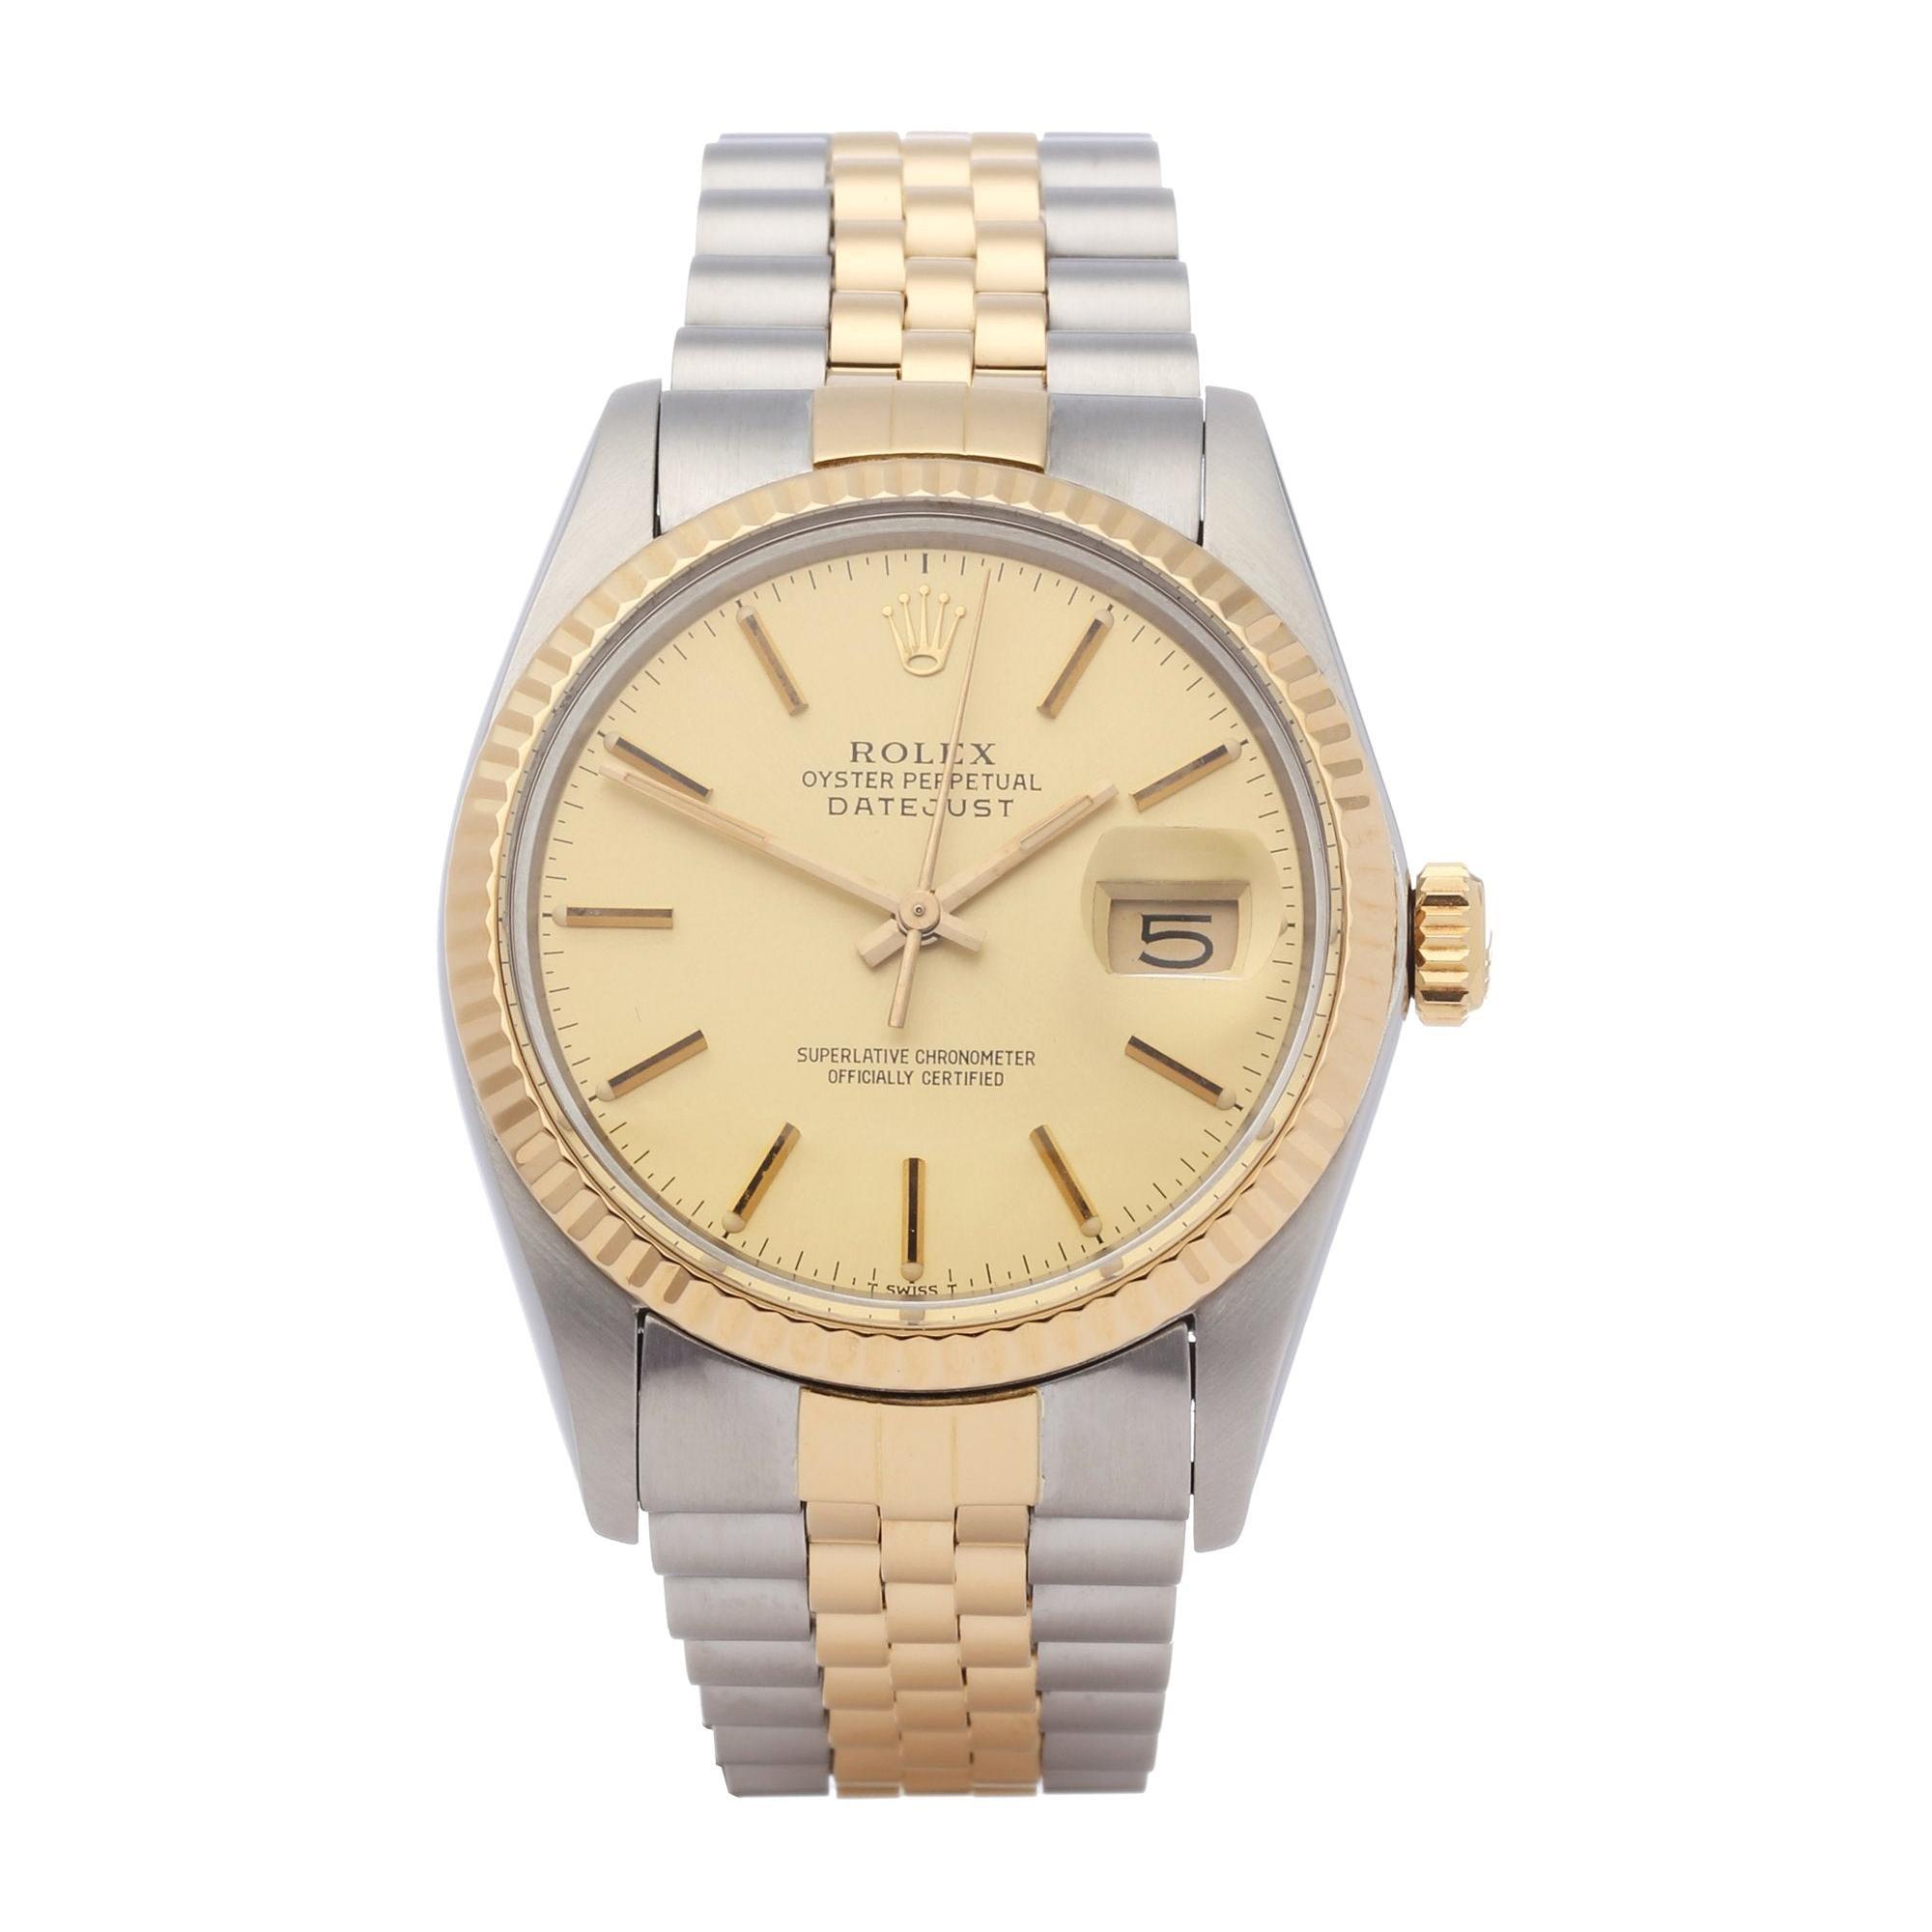 Rolex Datejust 36 16013 Unisex Yellow Gold & Stainless Steel Watch